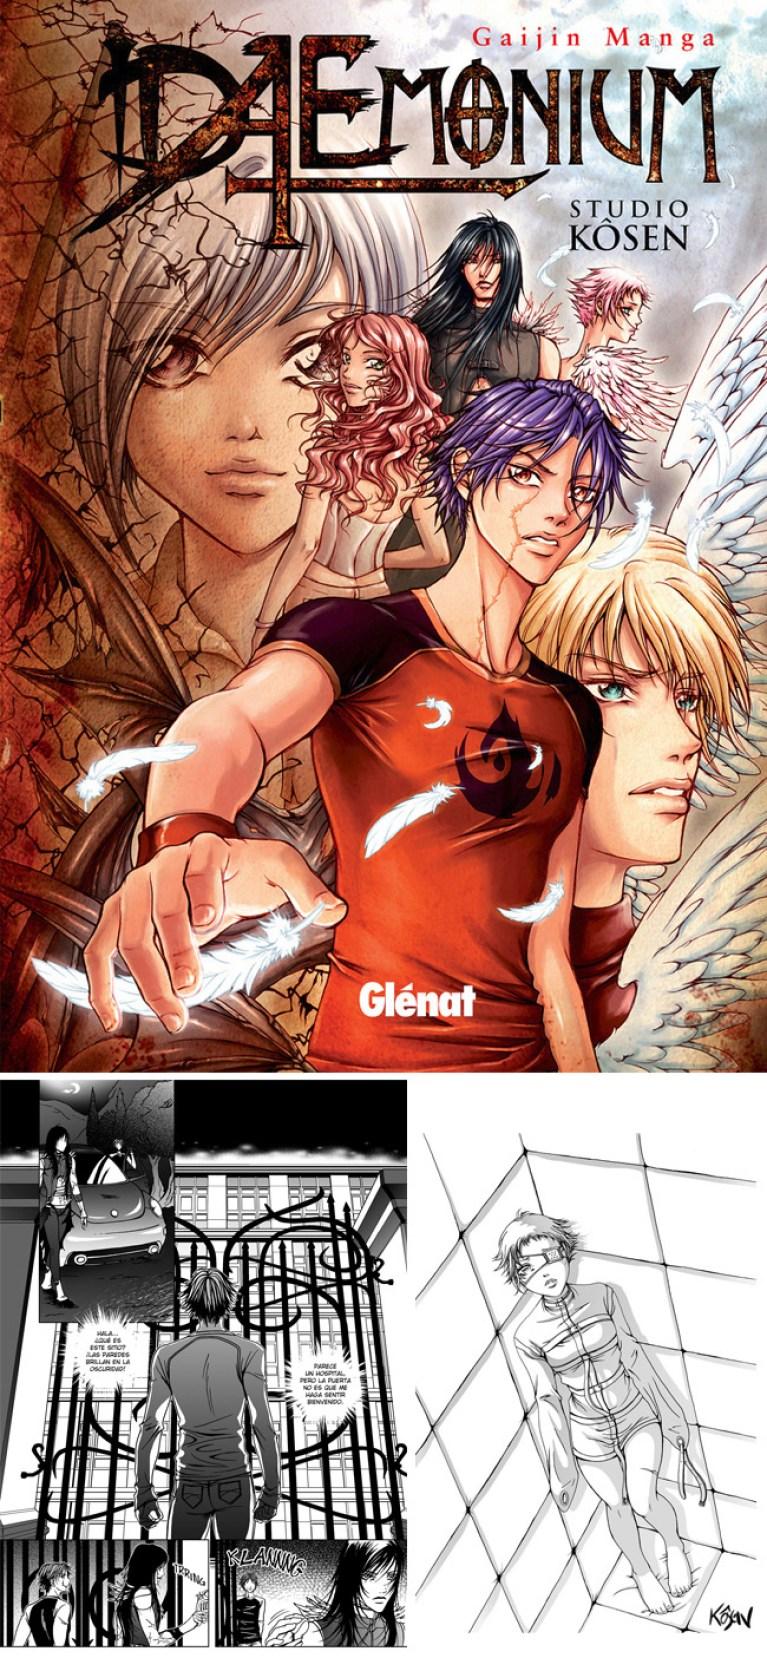 Daemonium-Diana-Fernandez-Studio-Kosen-Manga-Madrid-Academiac10